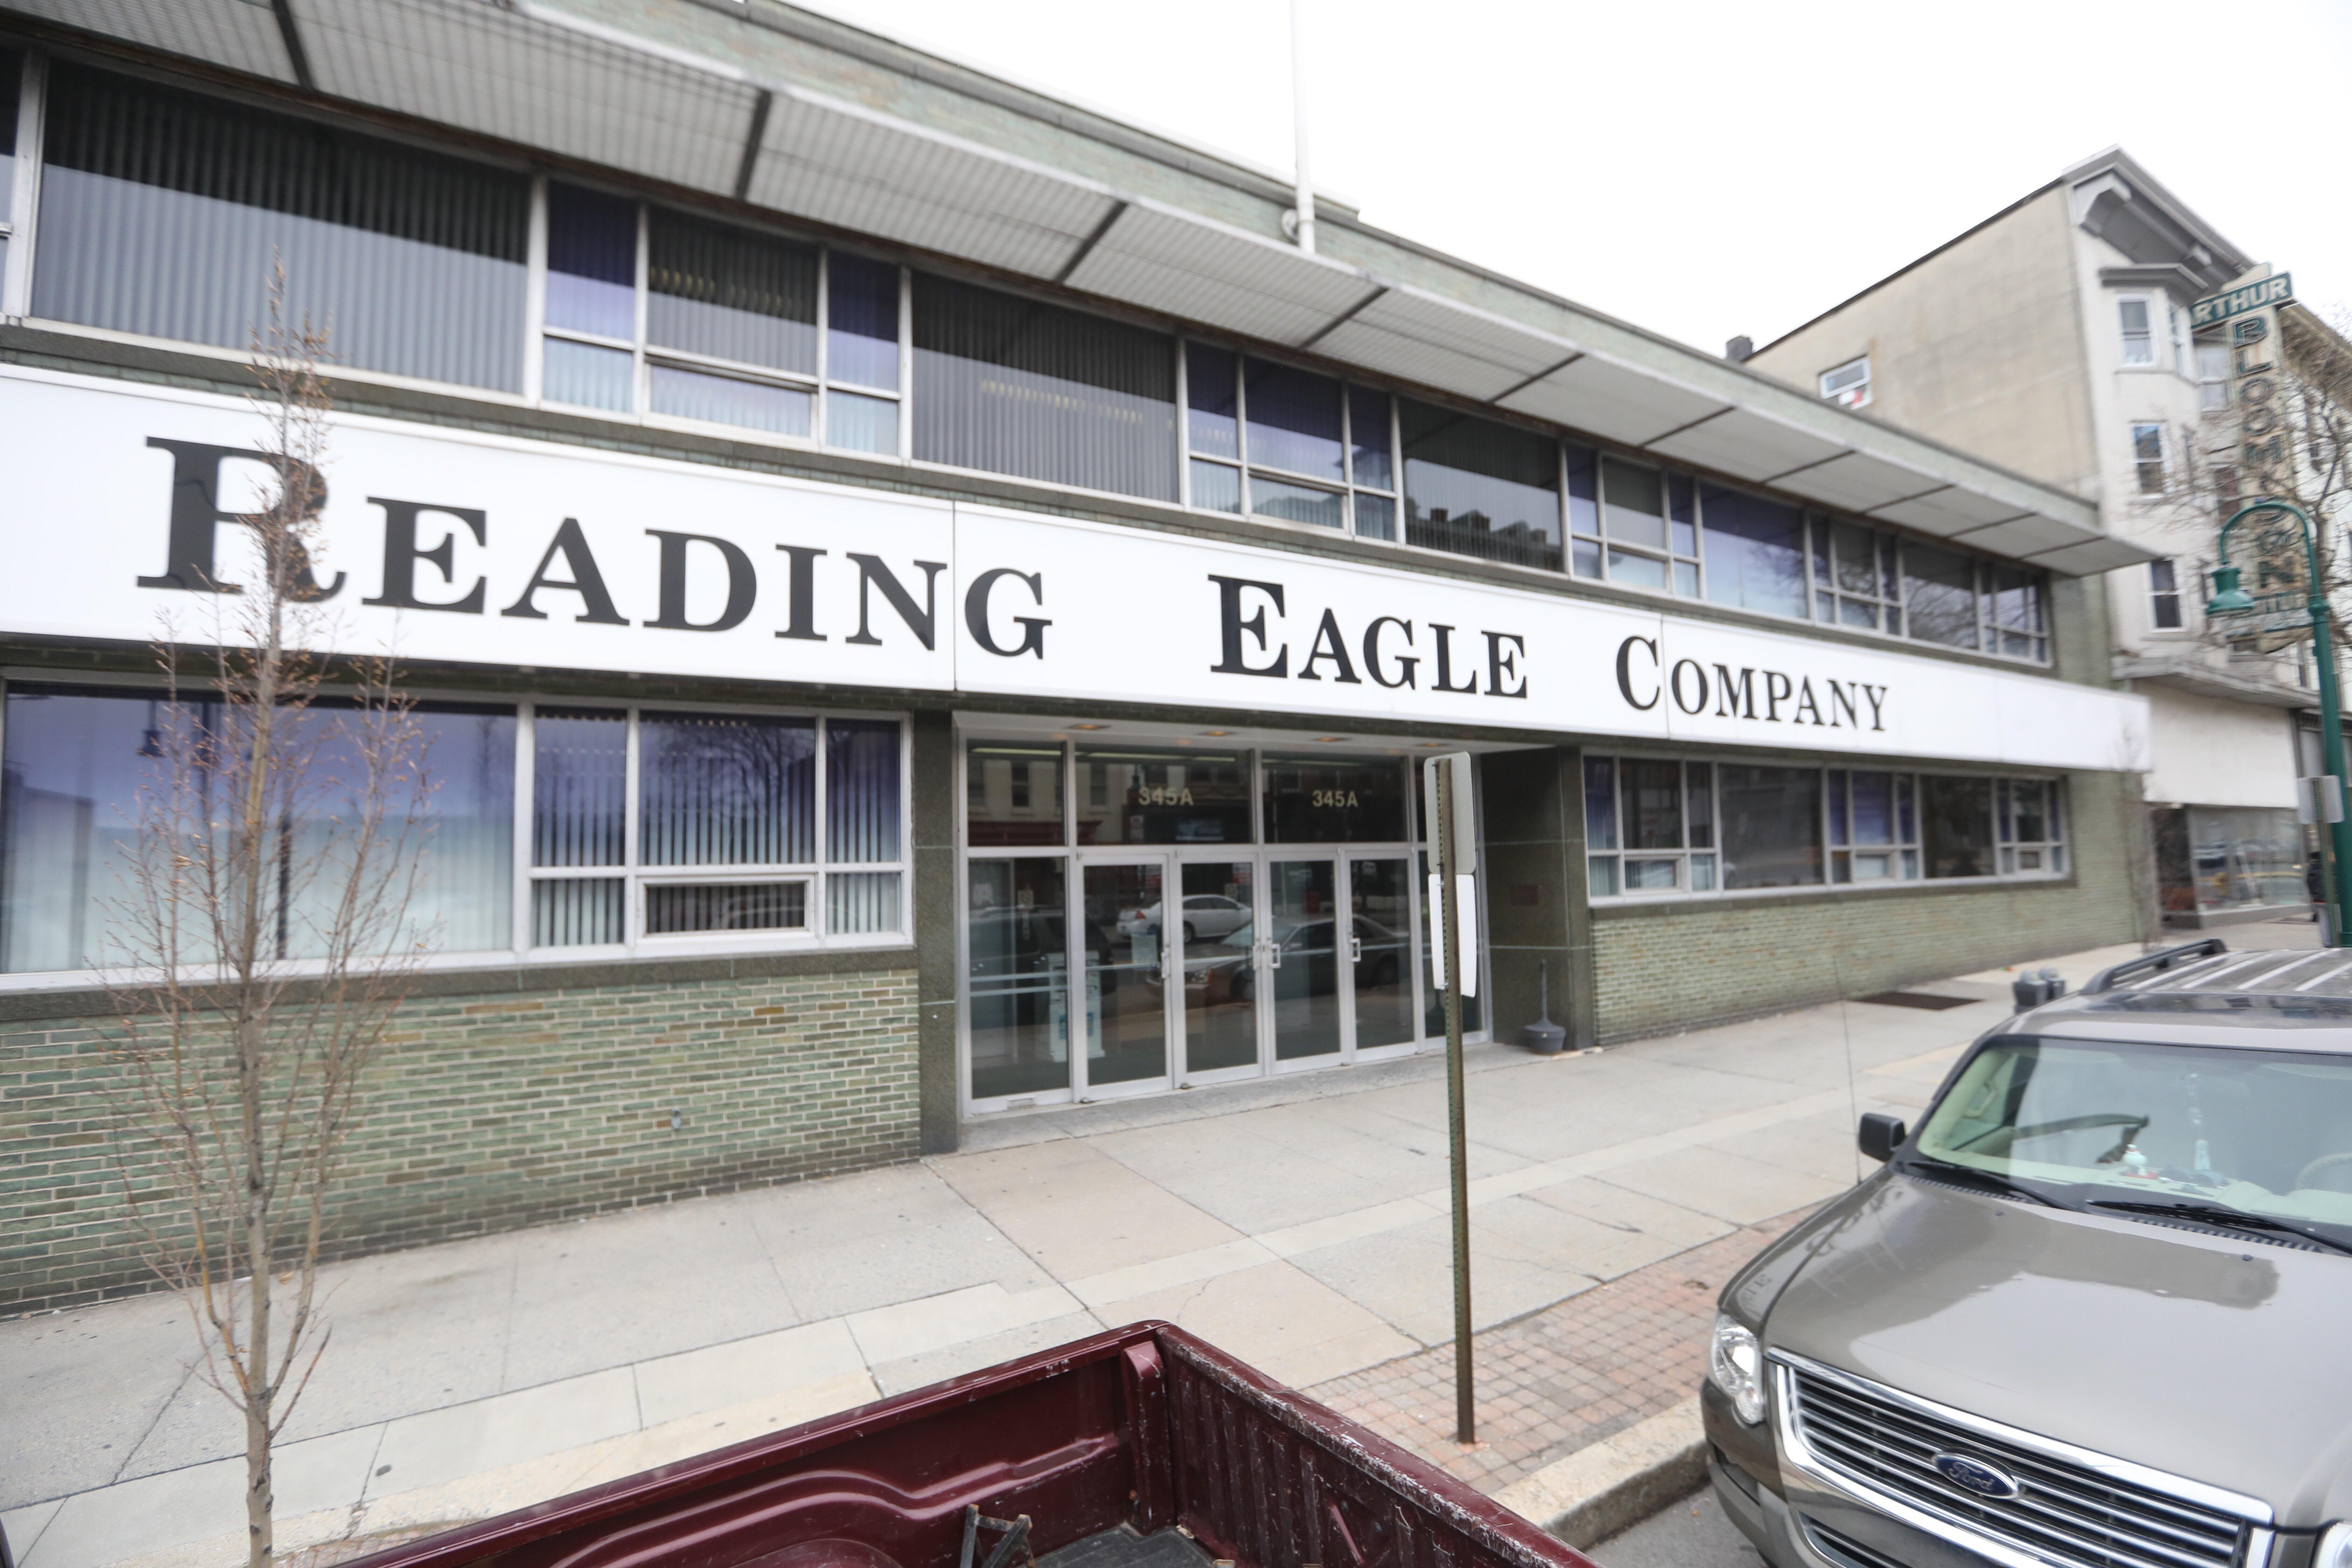 philly.com - Bob Fernandez - Cost-slashing Digital First Media to buy bankrupt Reading Eagle; Deep job cuts expected